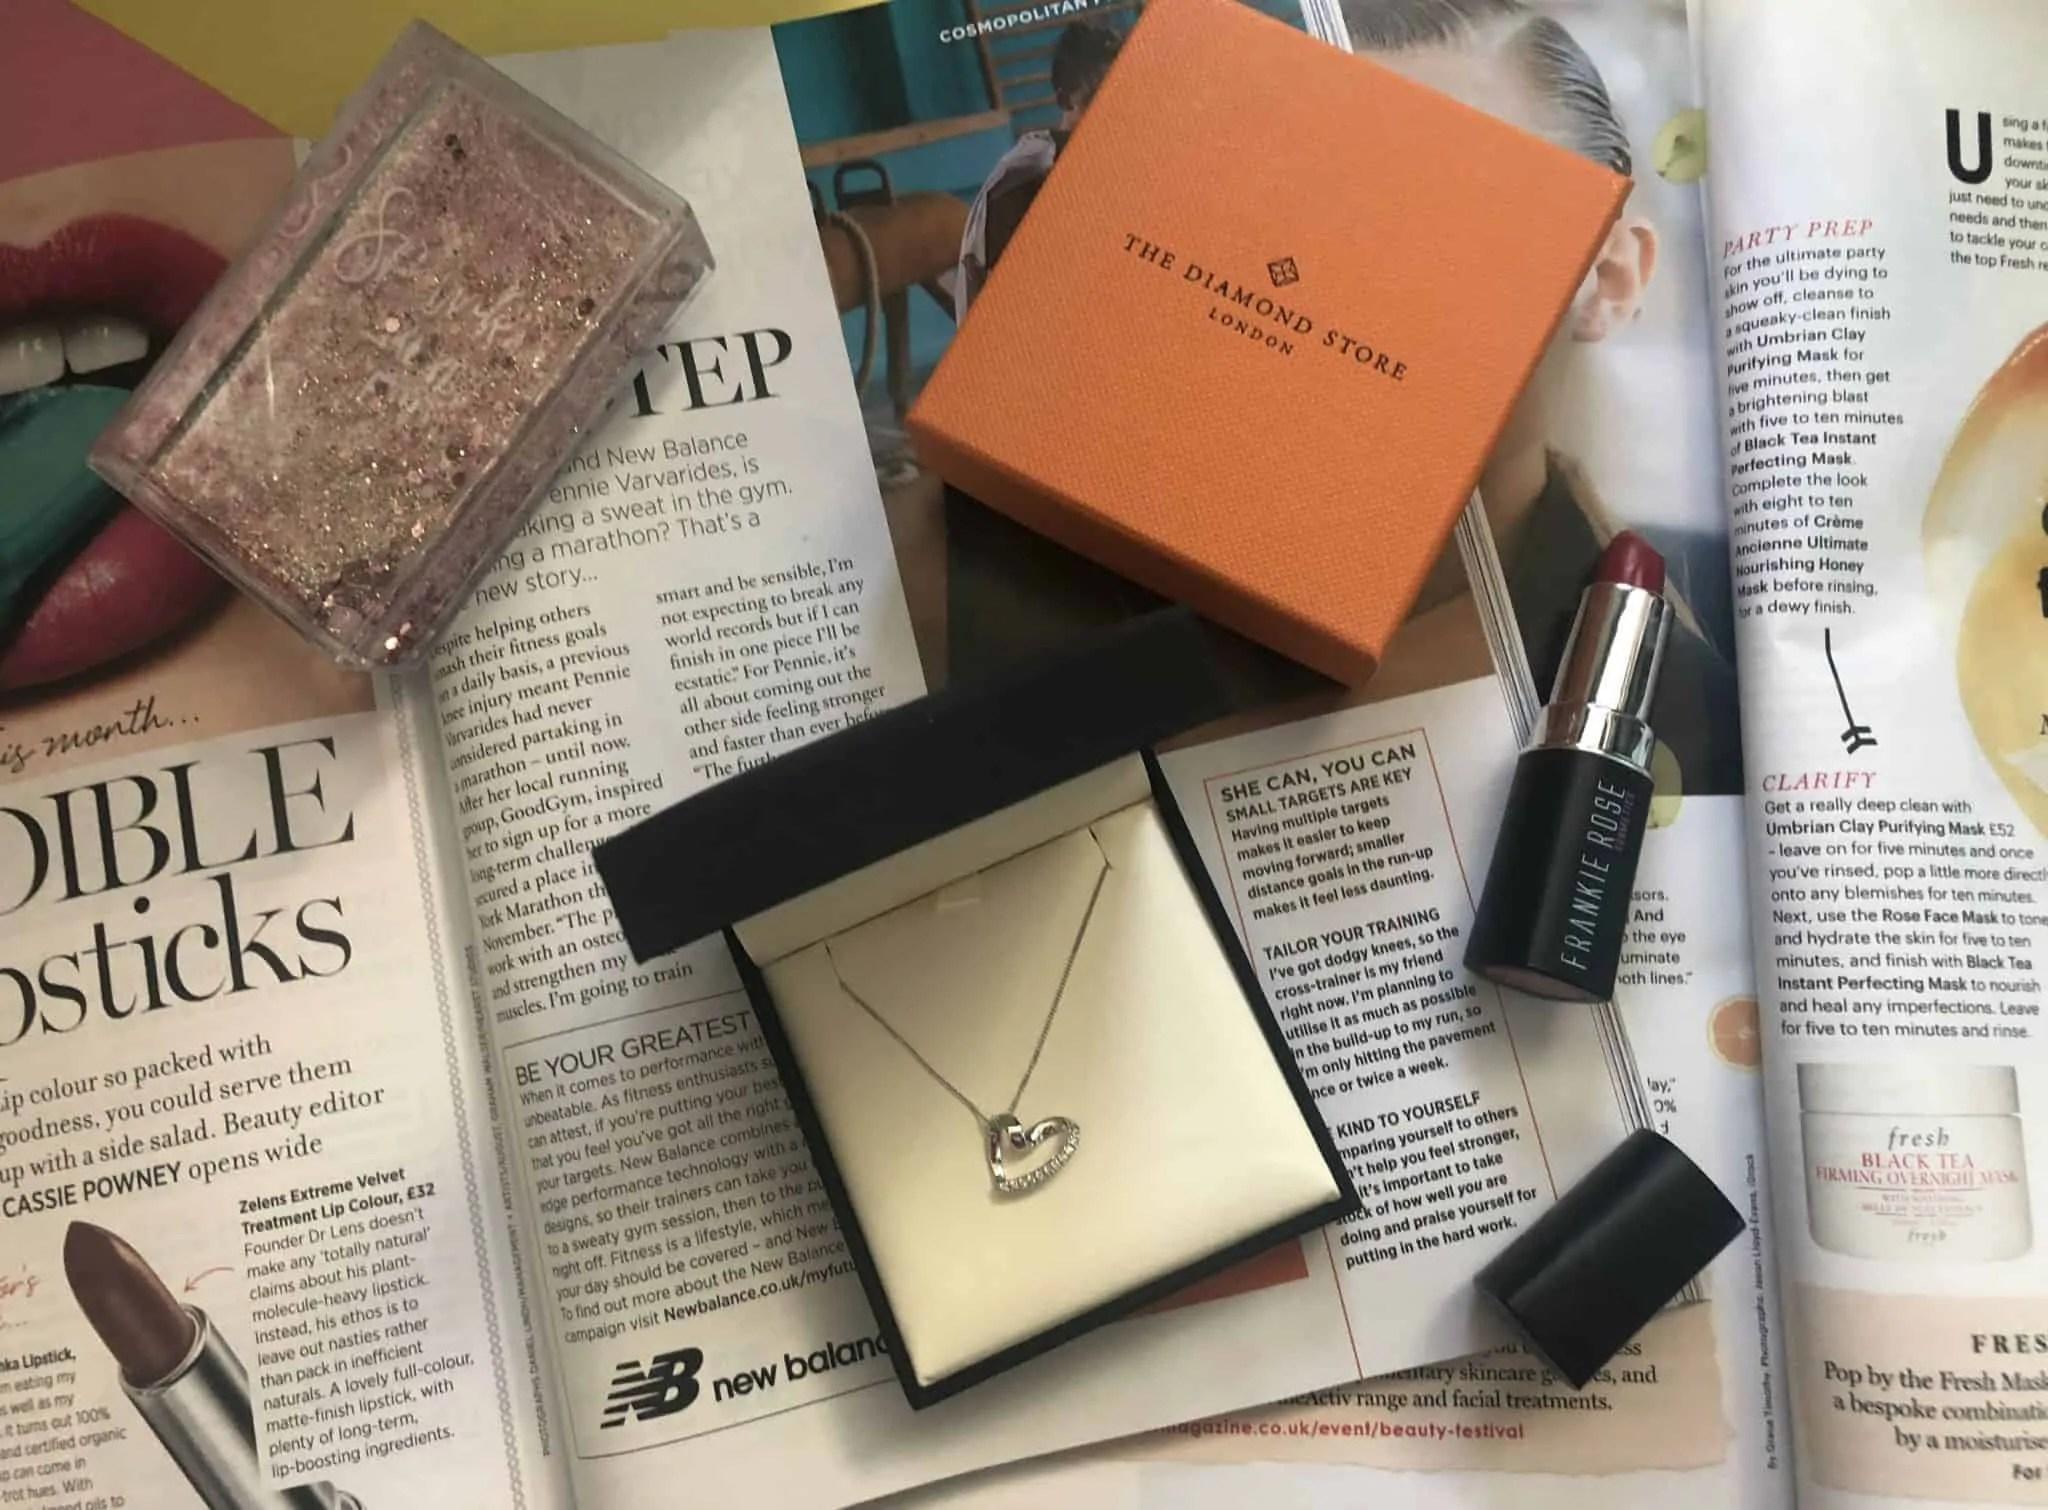 9 jewellery care tips to help your jewellery last longer